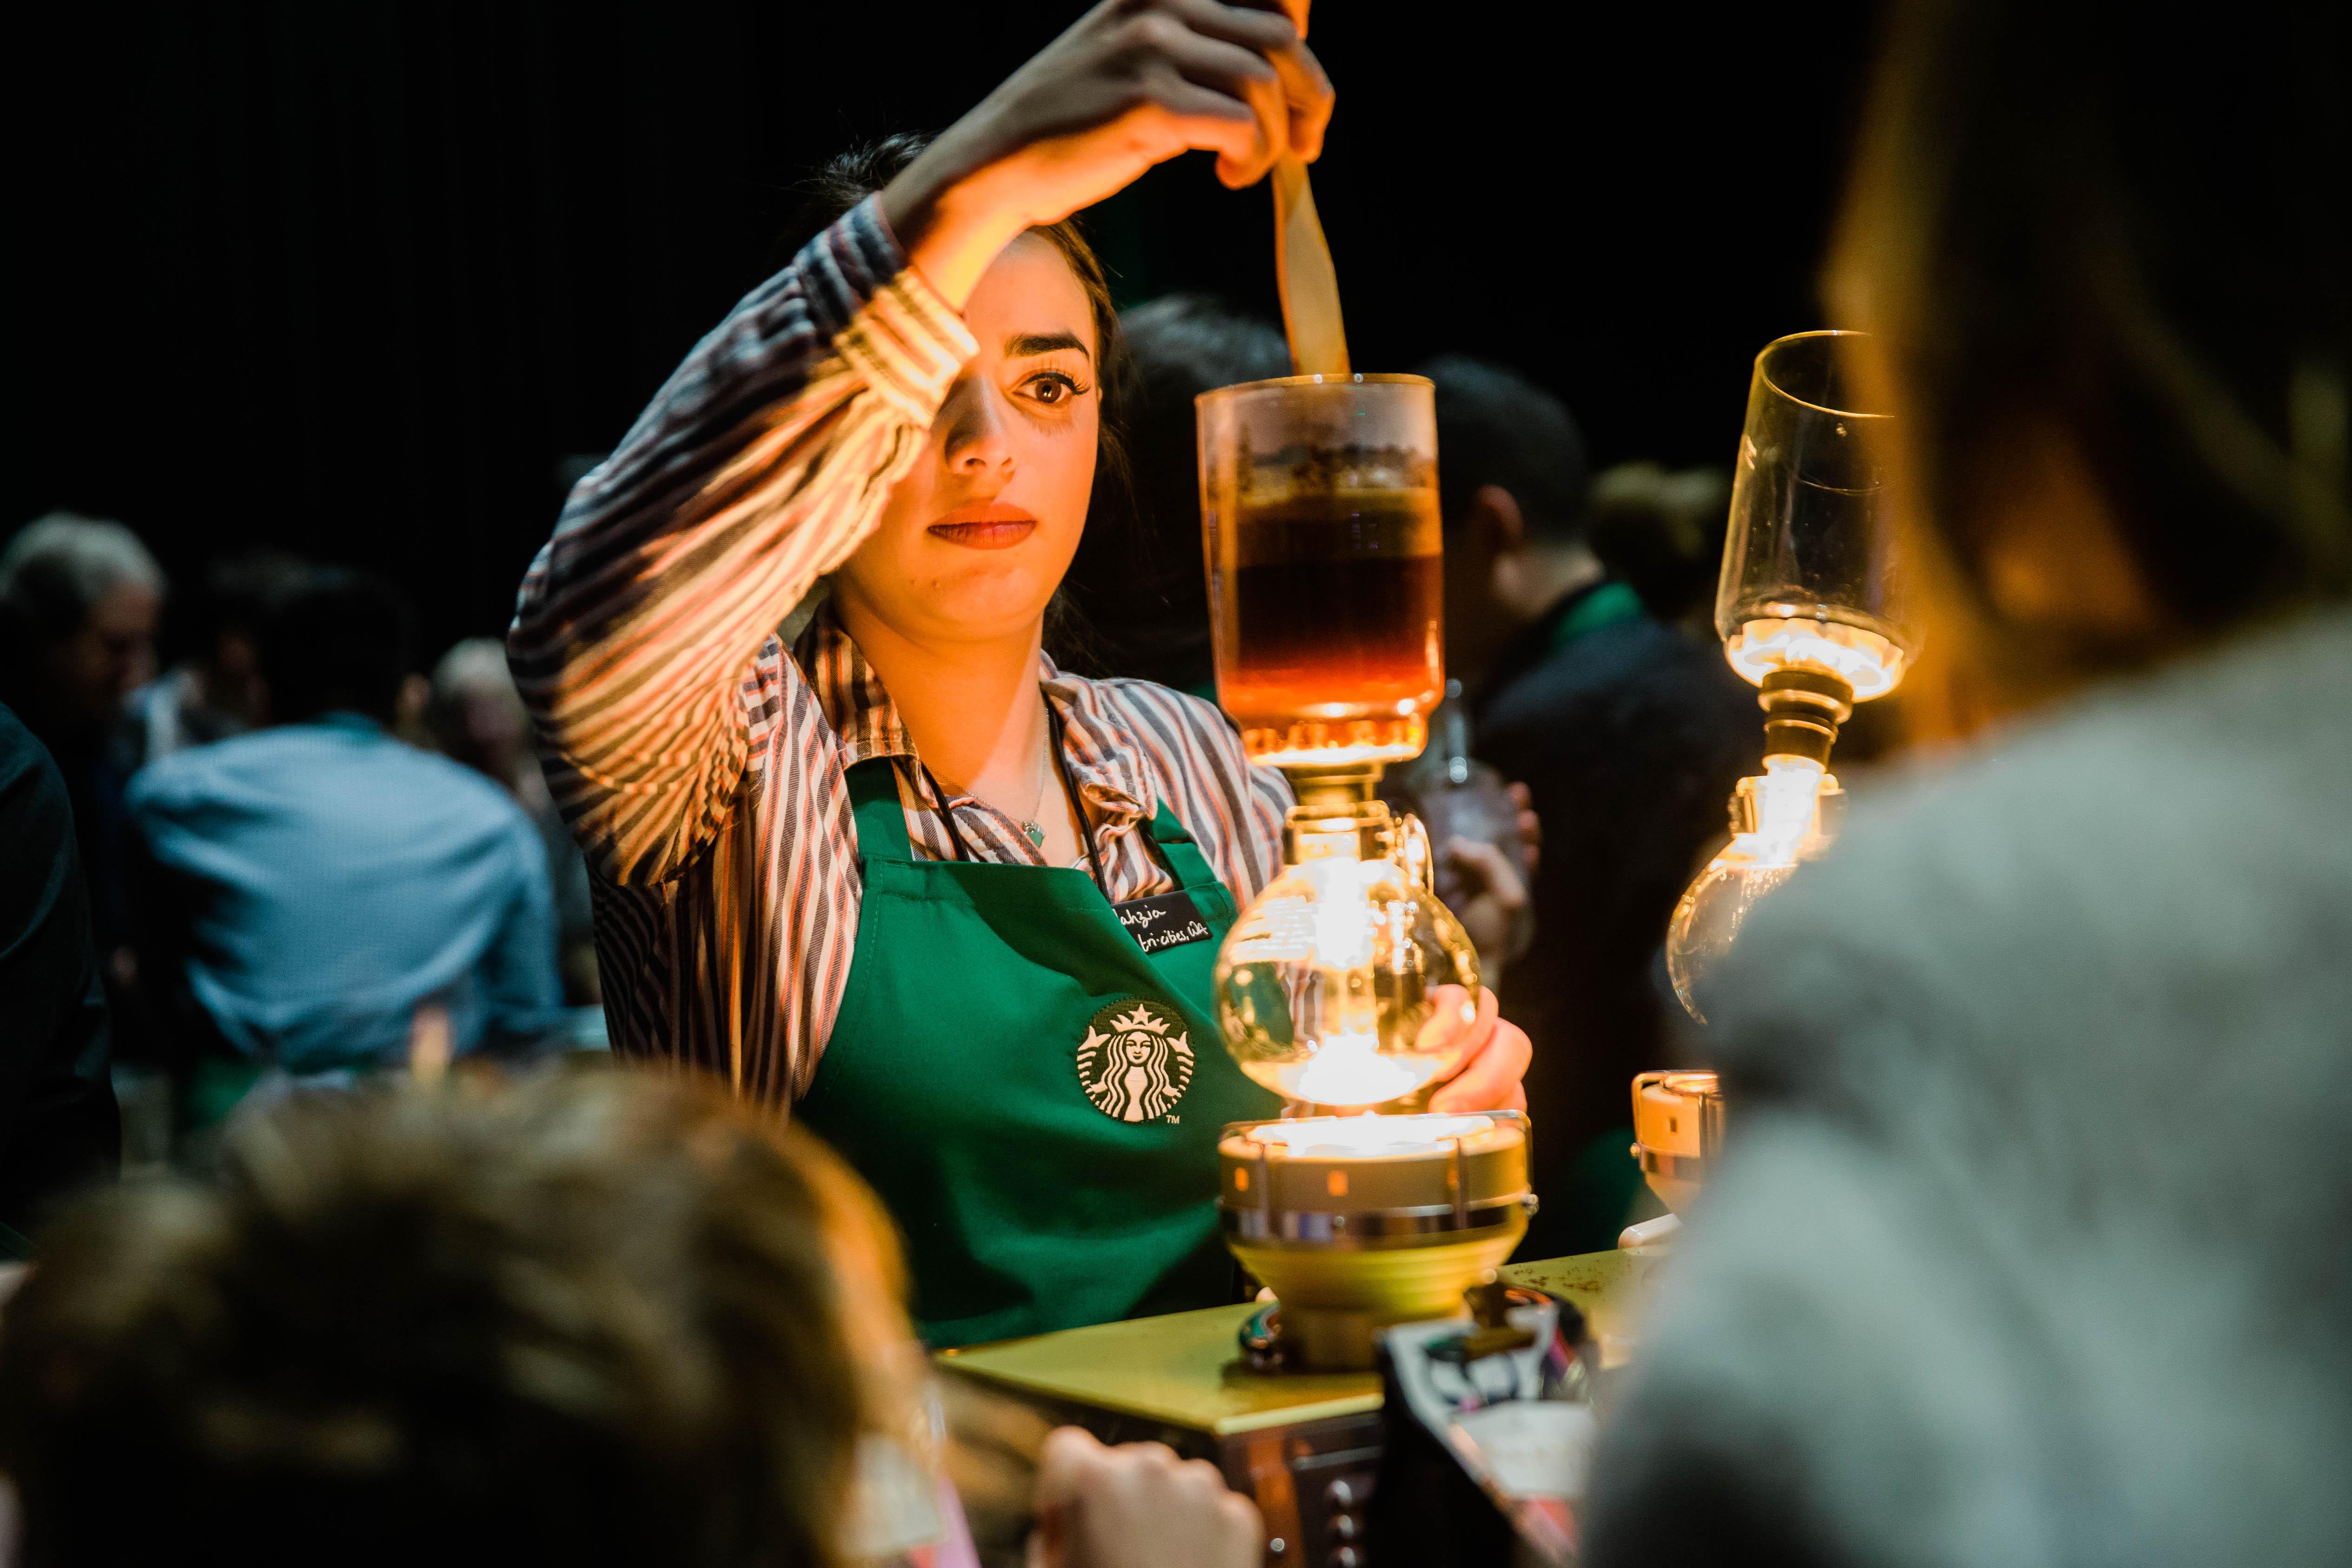 Photos: Highlights of Starbucks 2019 Annual Meeting - Starbucks Stories